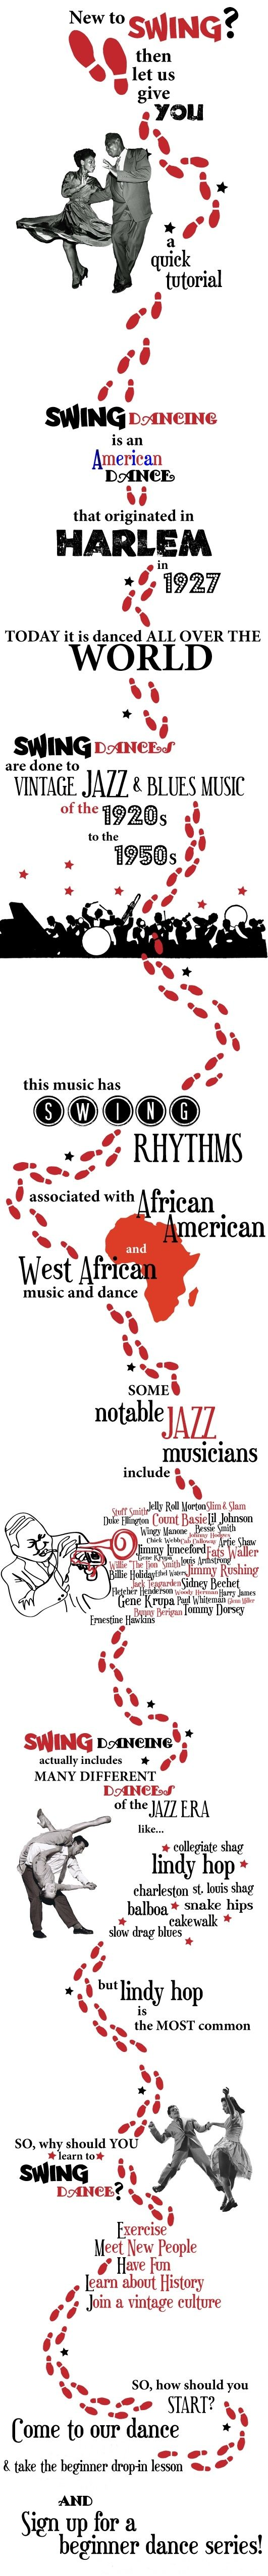 17 Best Dicas De Dana Images On Pinterest Ballroom Dance Rumba Step Diagram Swing Dancing Infographic Fun For Introducing People To